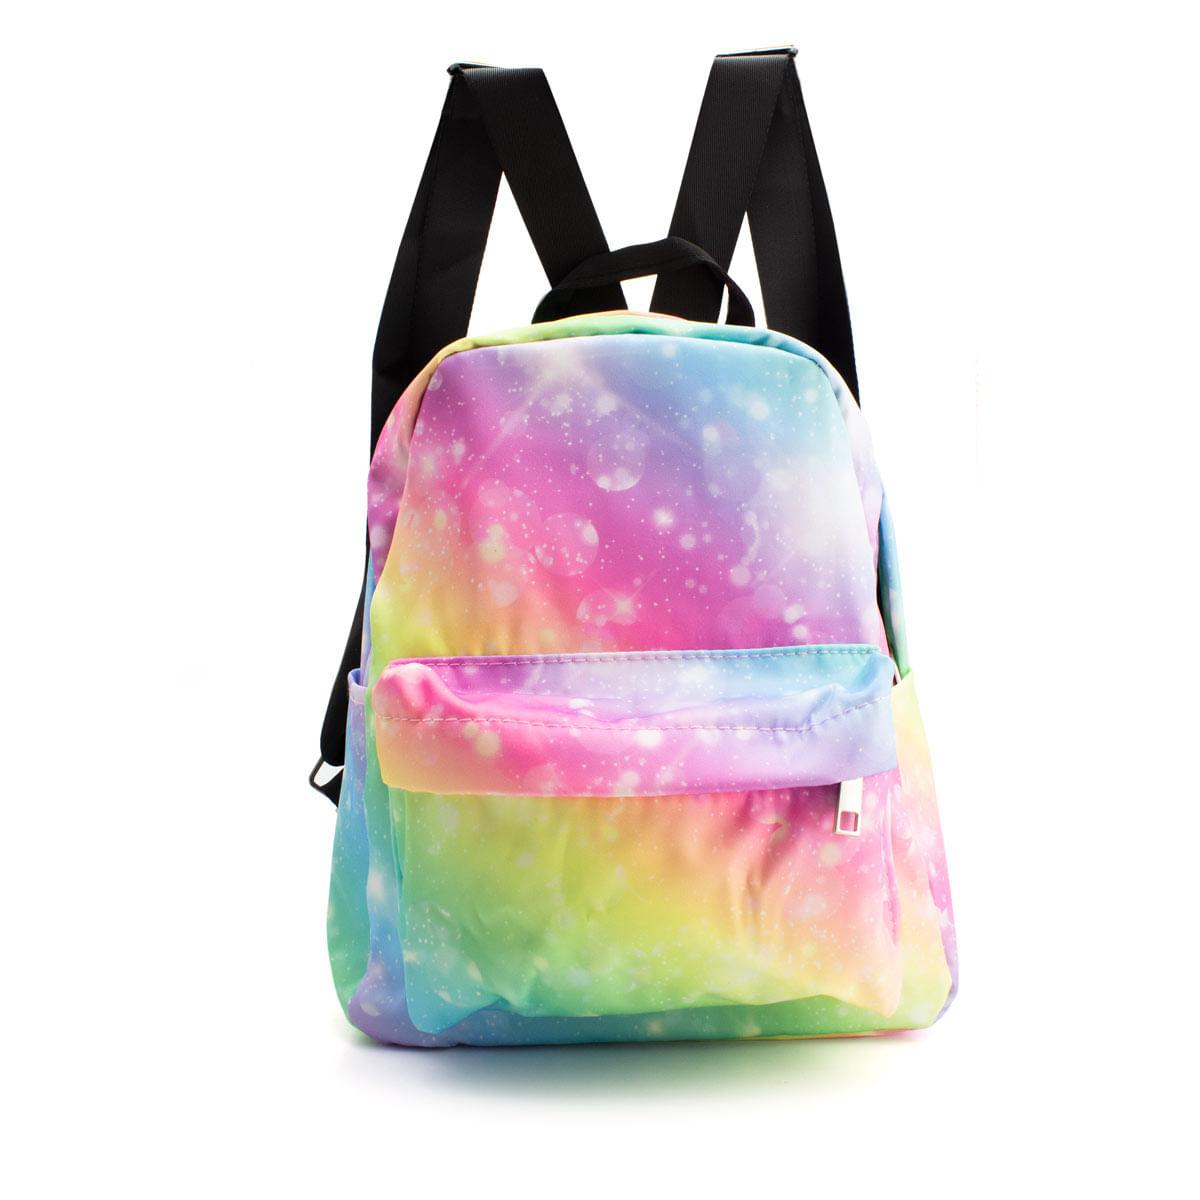 Mochila-Infantil-Universo-Tie-Dye-Ludique-et-Badin-K01024--VER21-